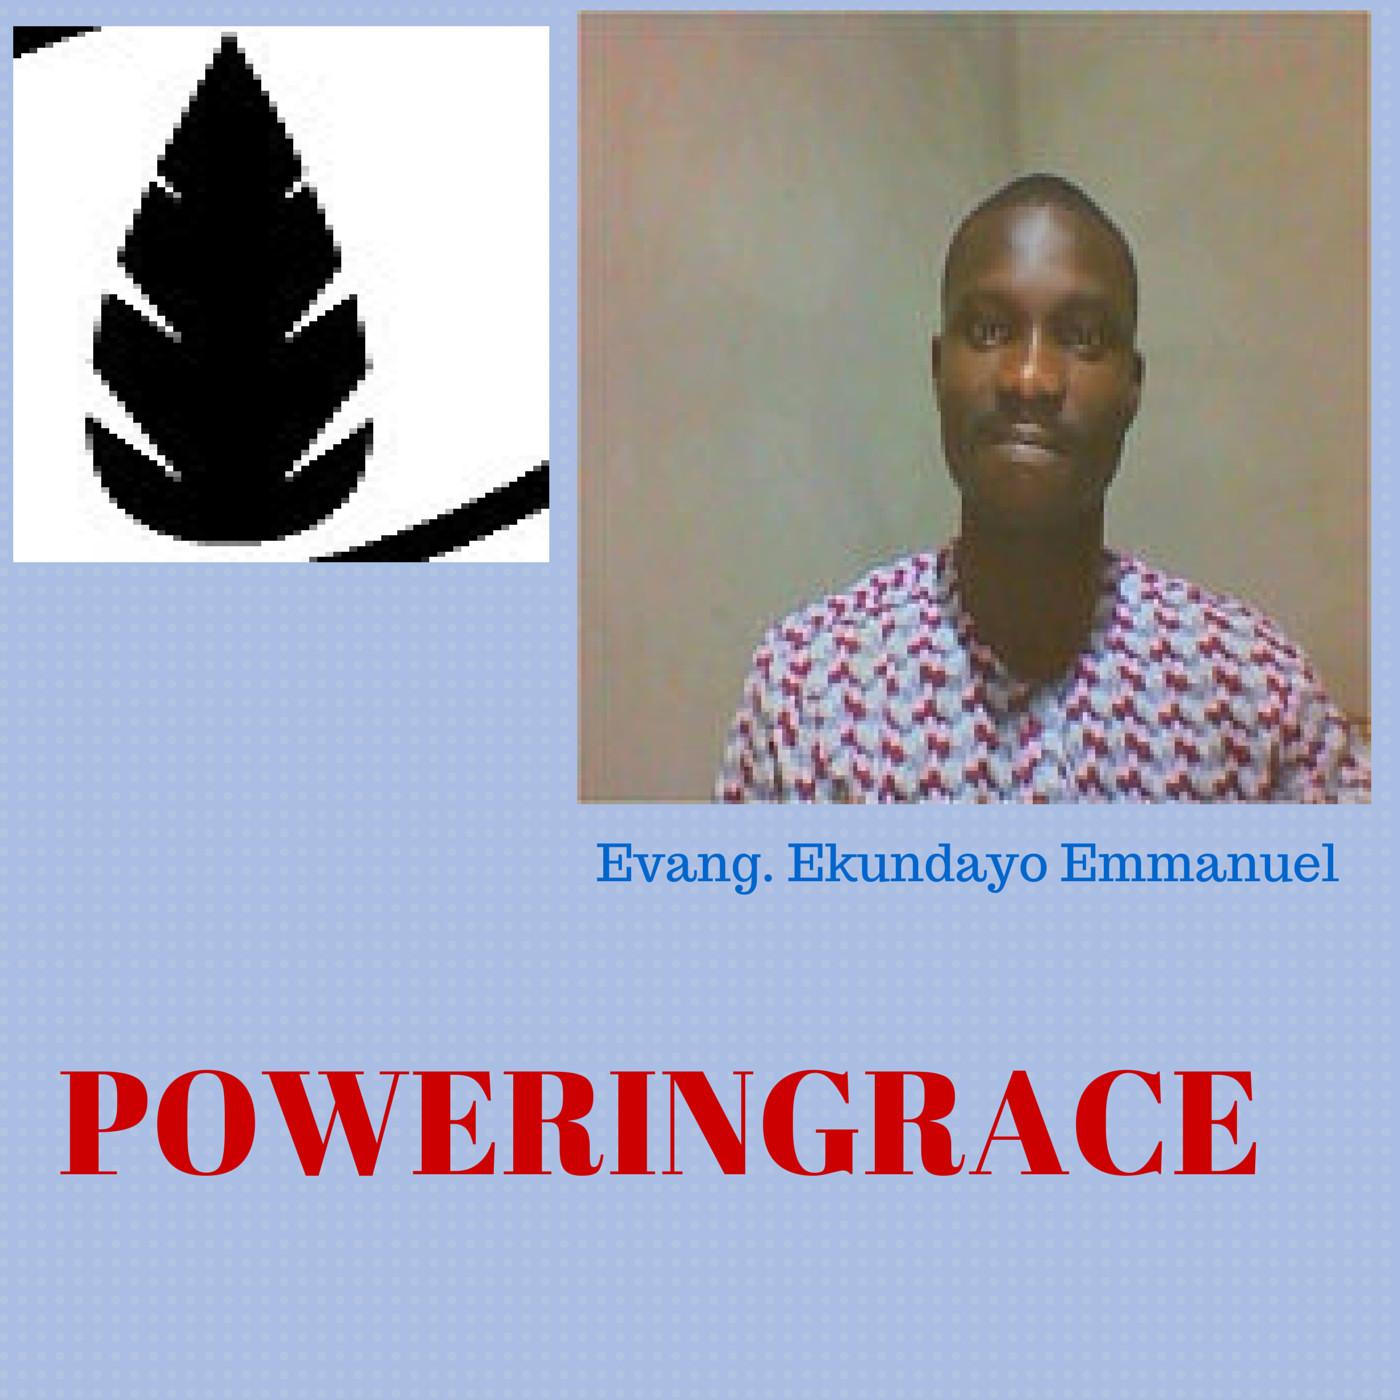 PowerinGrace